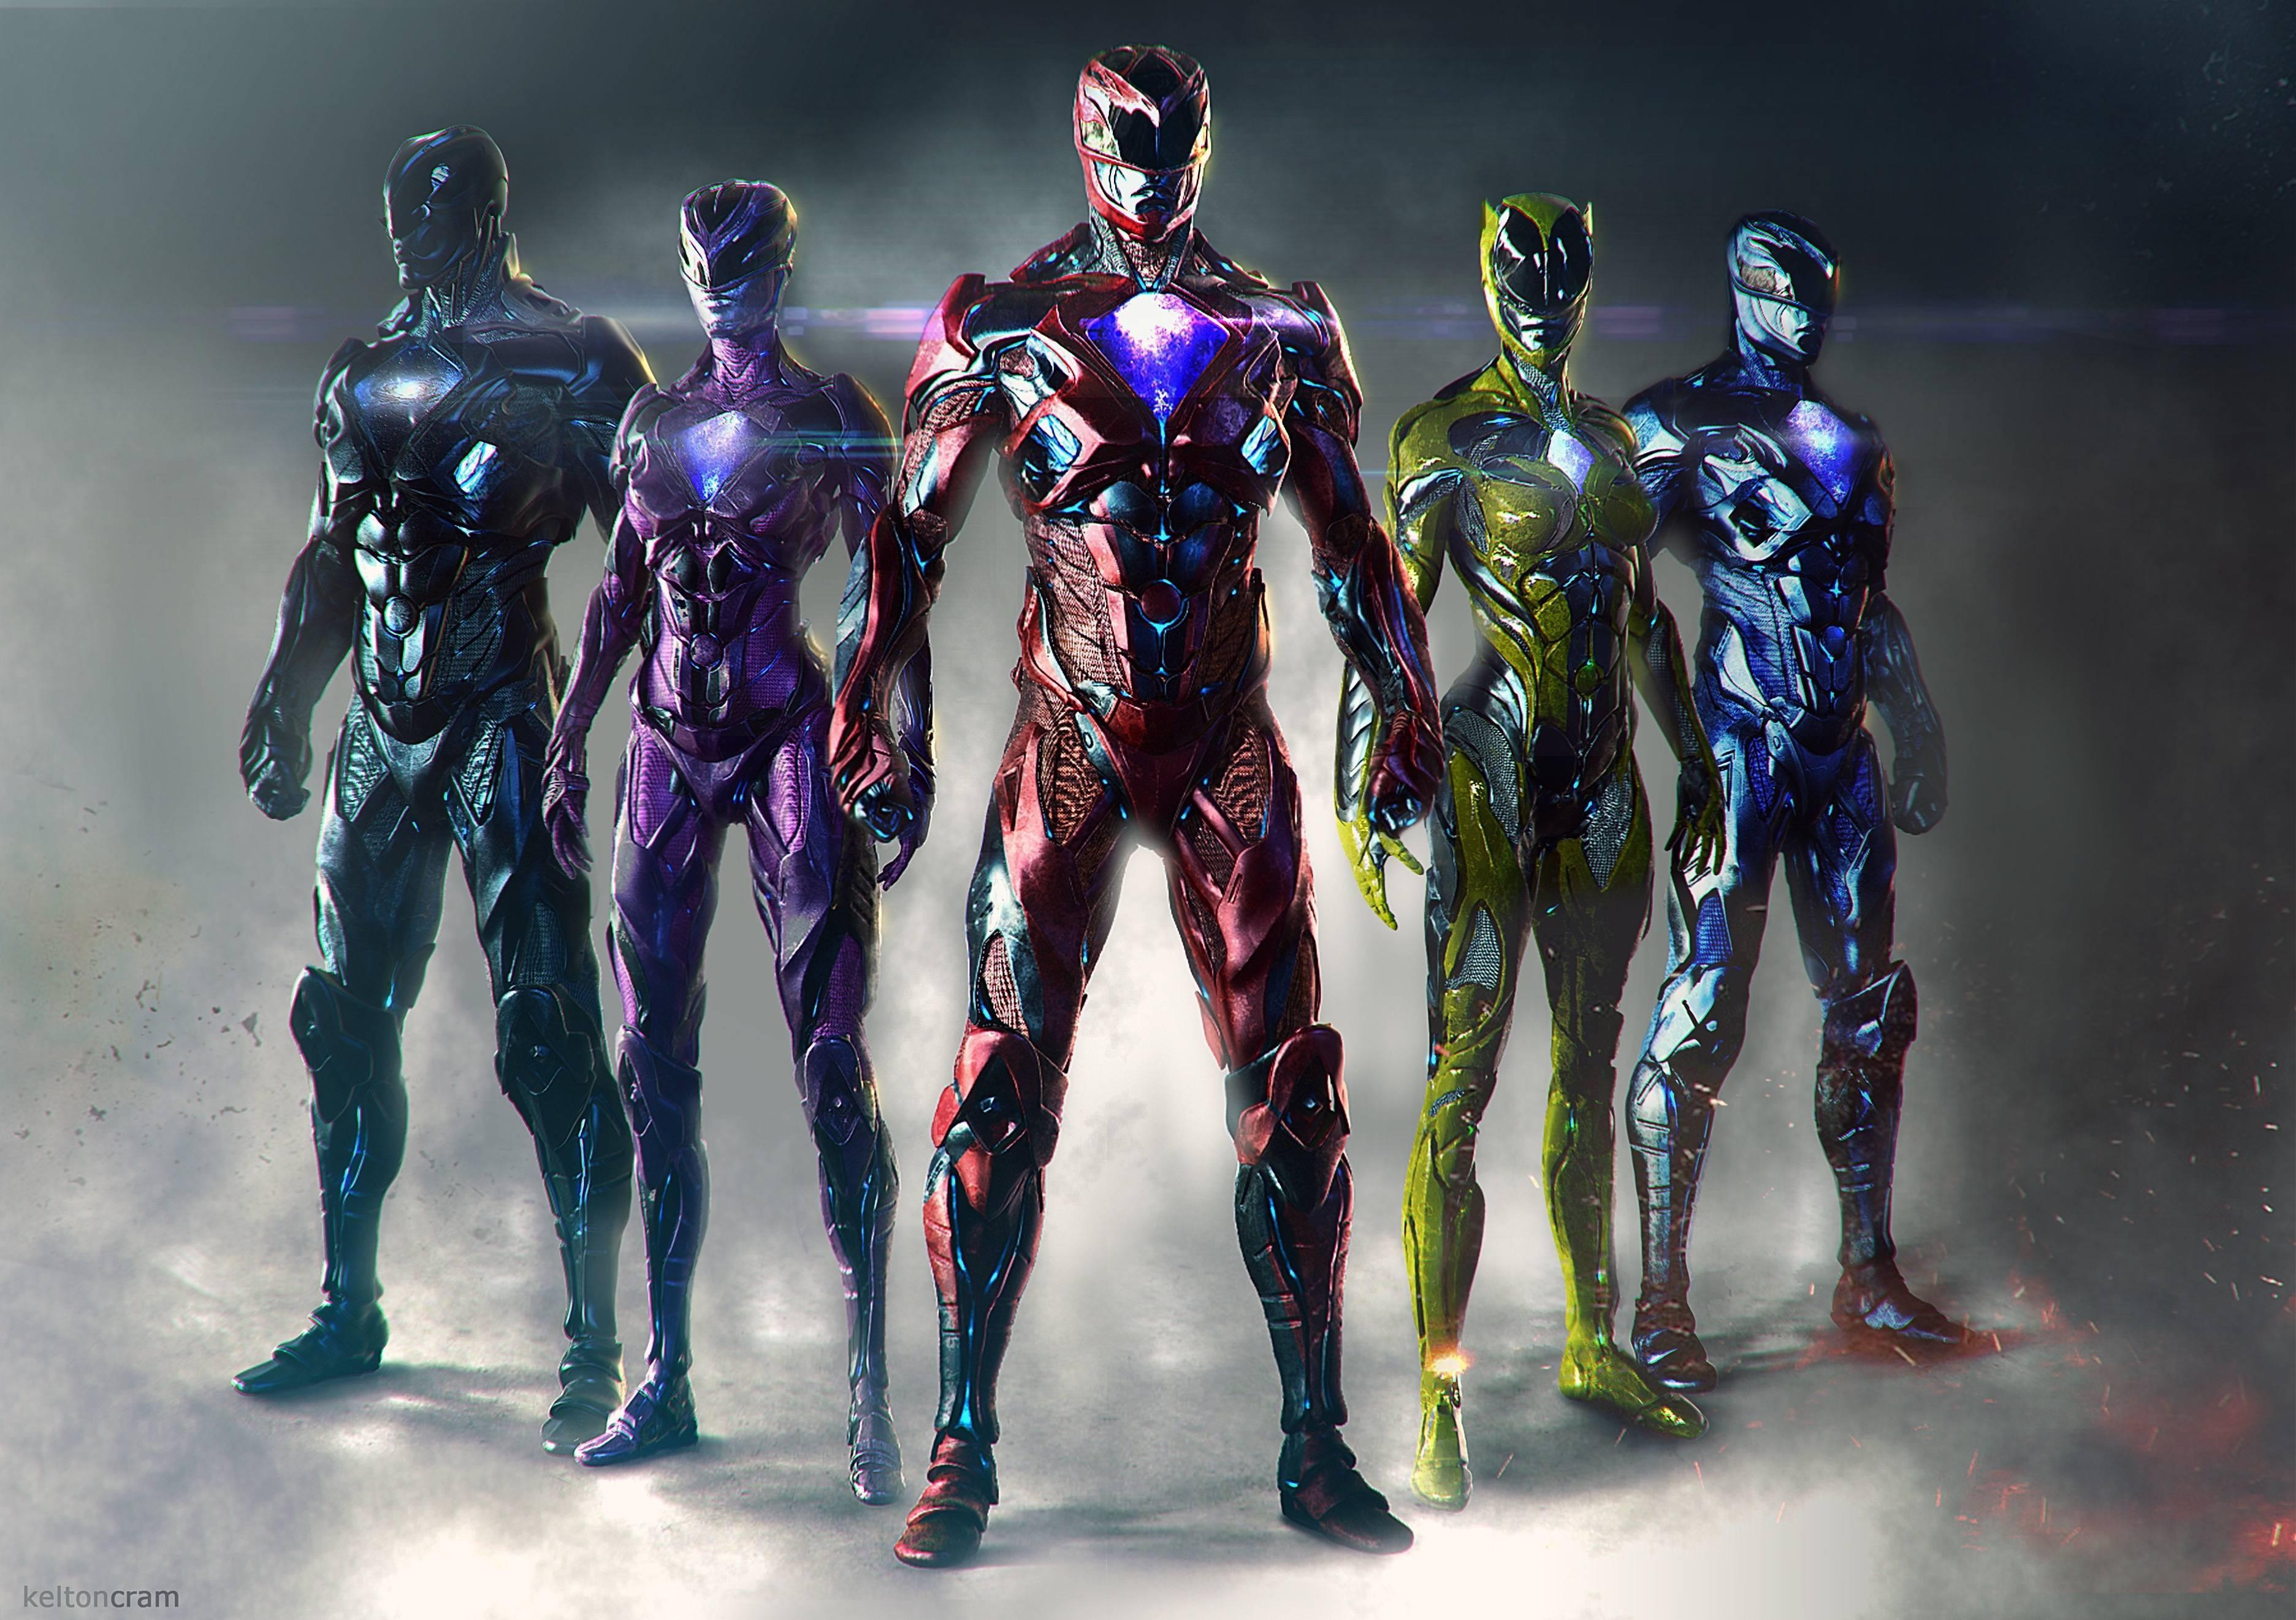 Power Rangers Artwork, HD Movies, 4k Wallpapers, Images ...